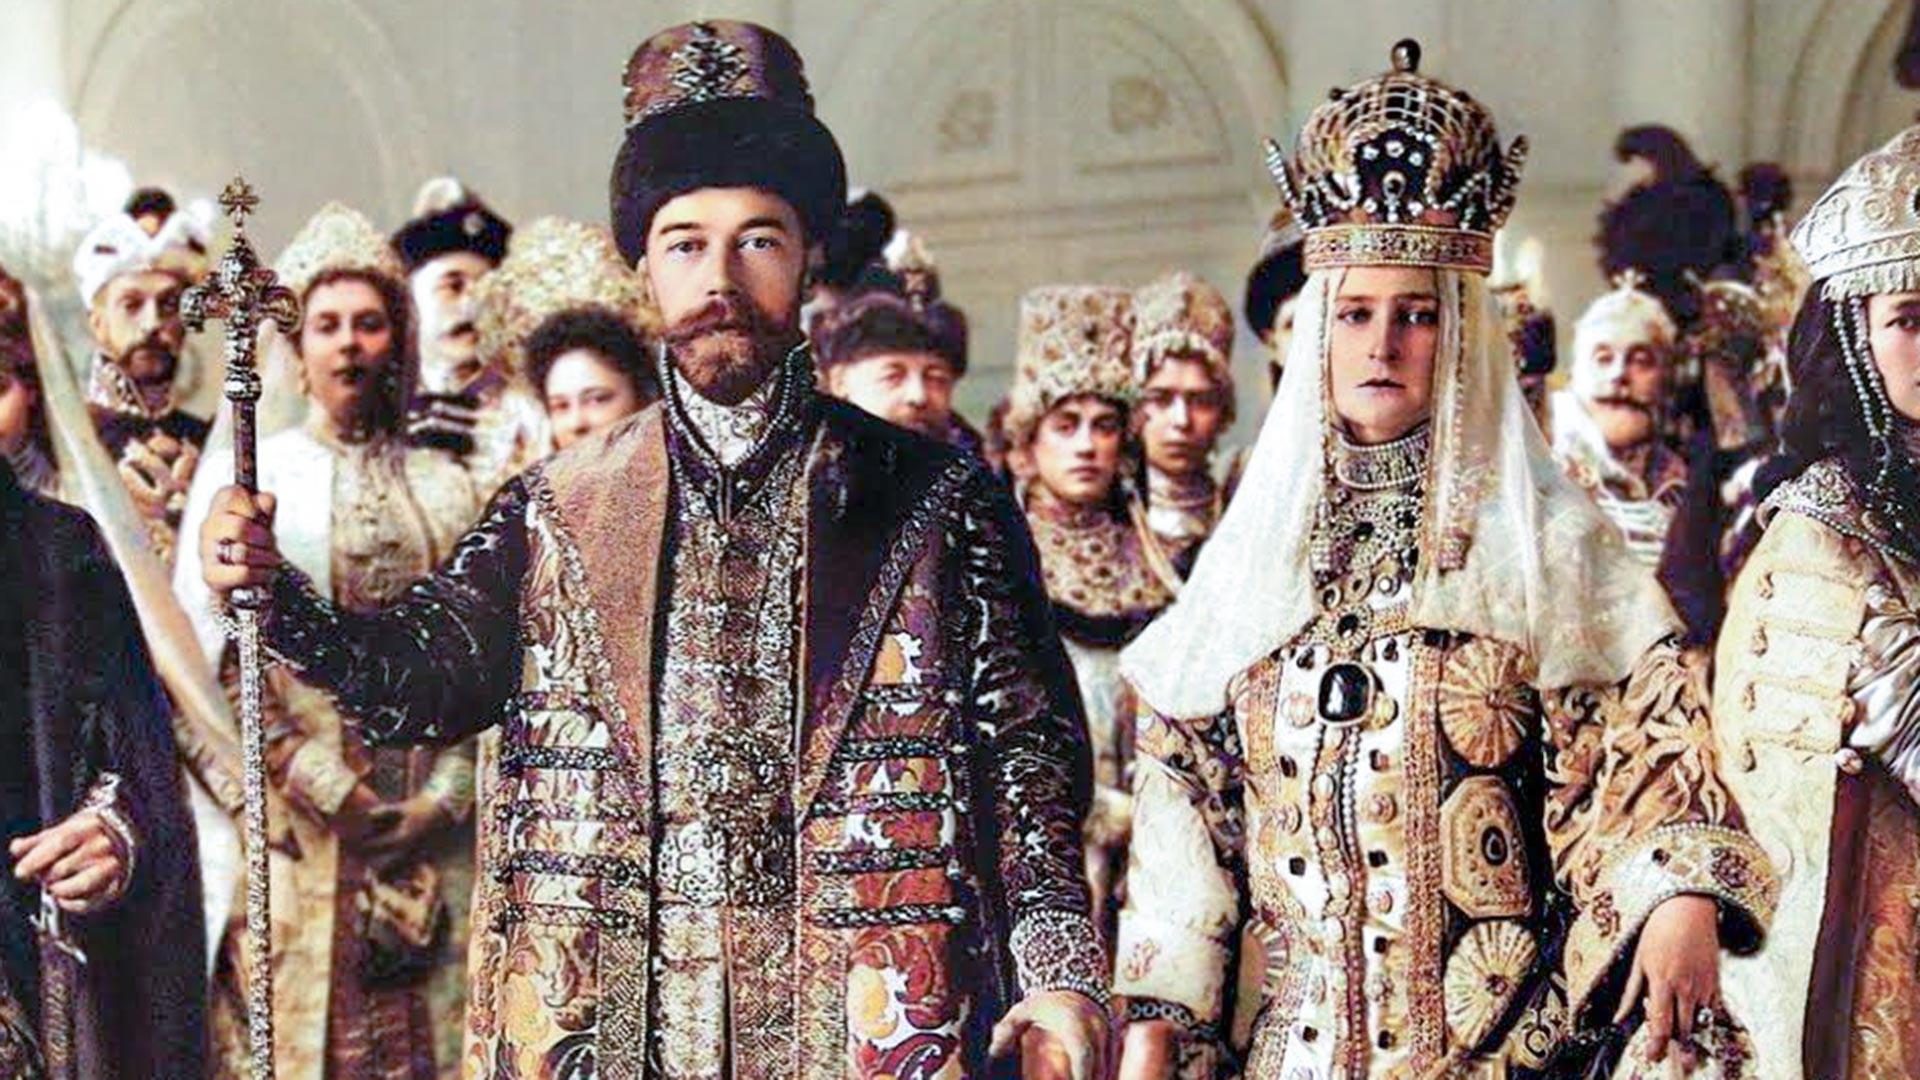 Nicolas II et Alexandra Feodorovna en costumes russes